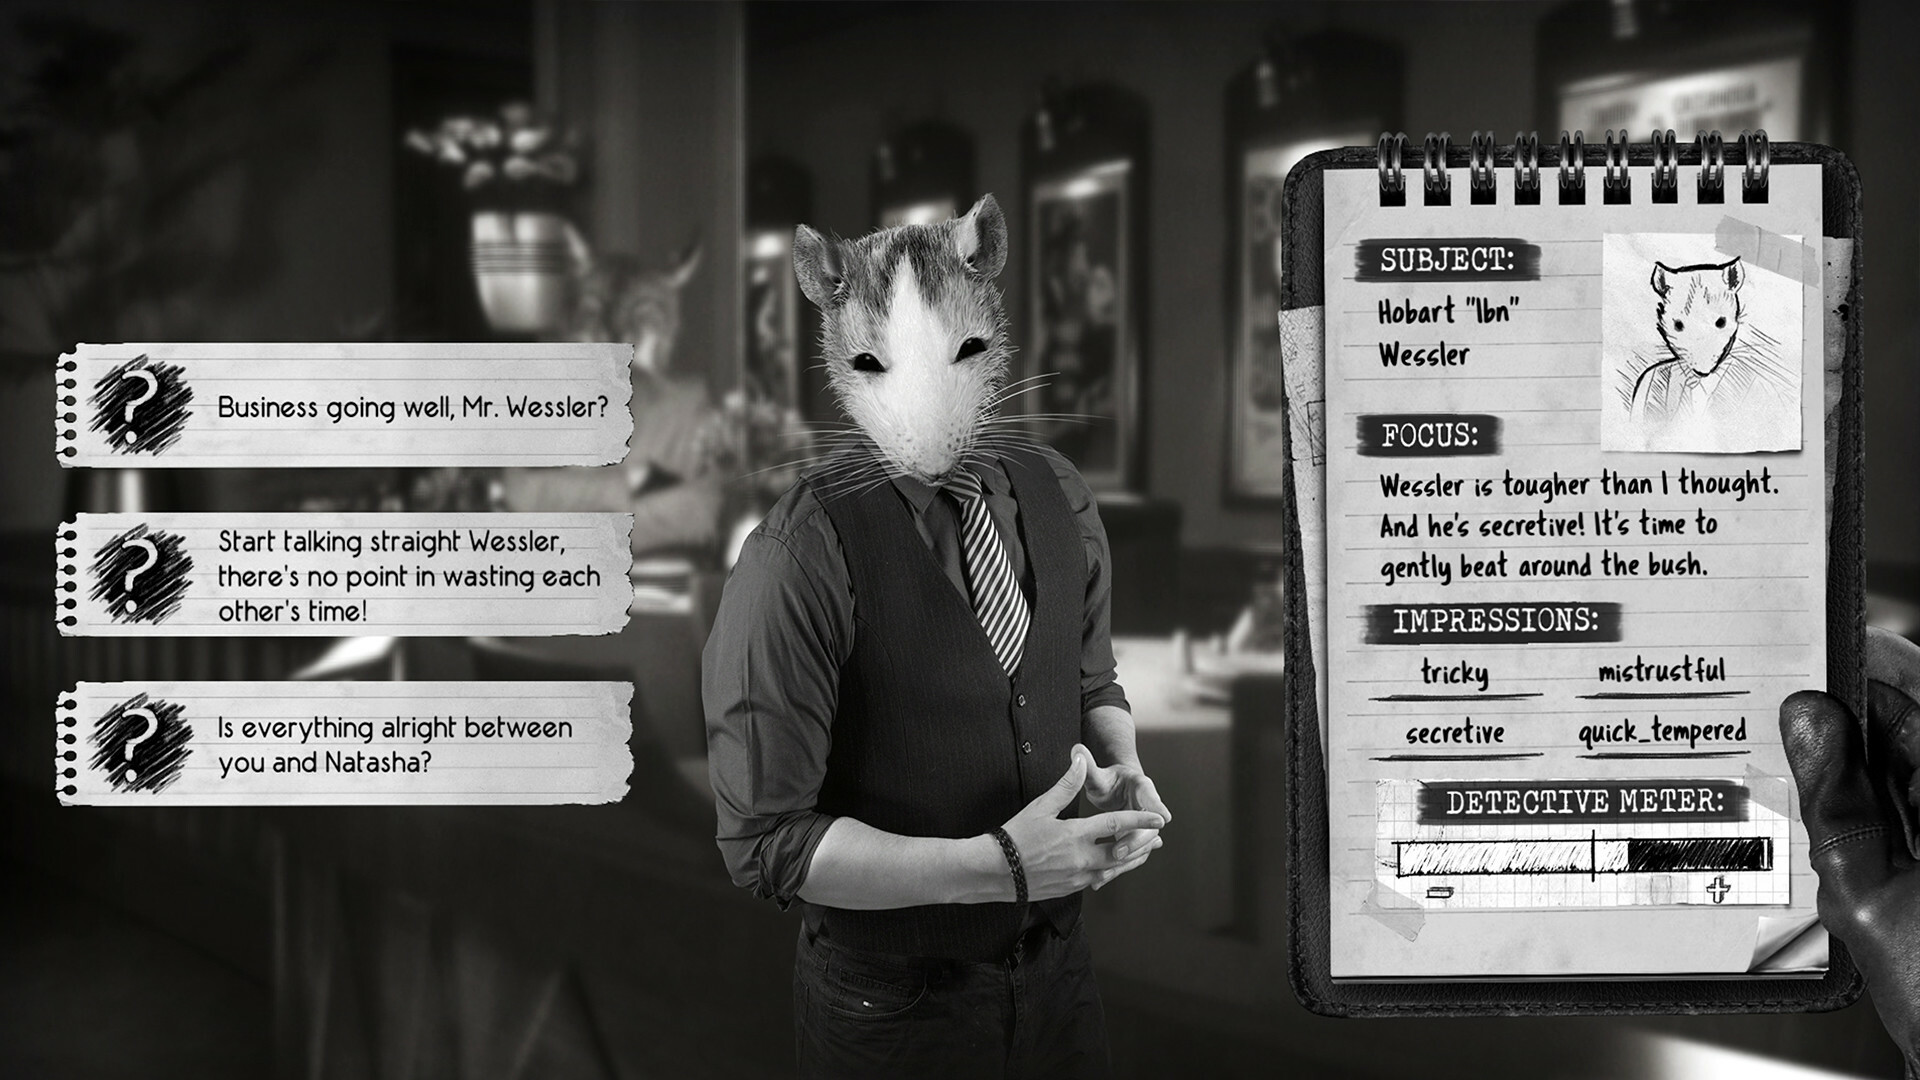 chicken-police-pc-screenshot-04